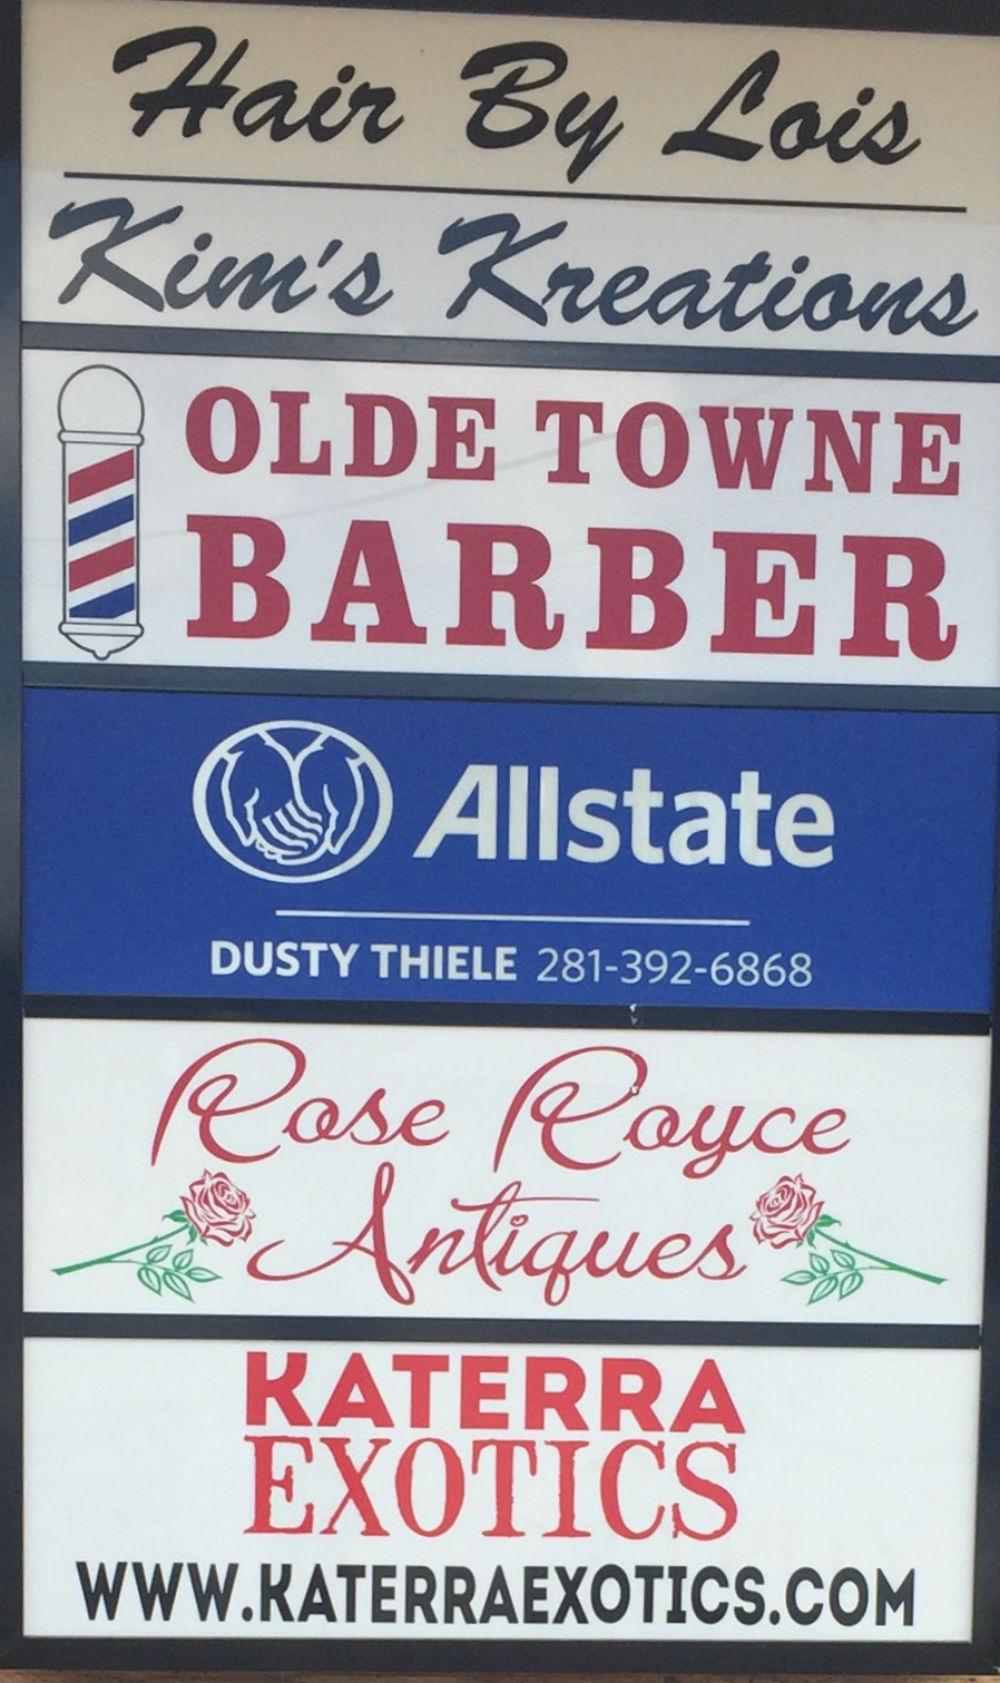 Dusty Thiele: Allstate Insurance image 1